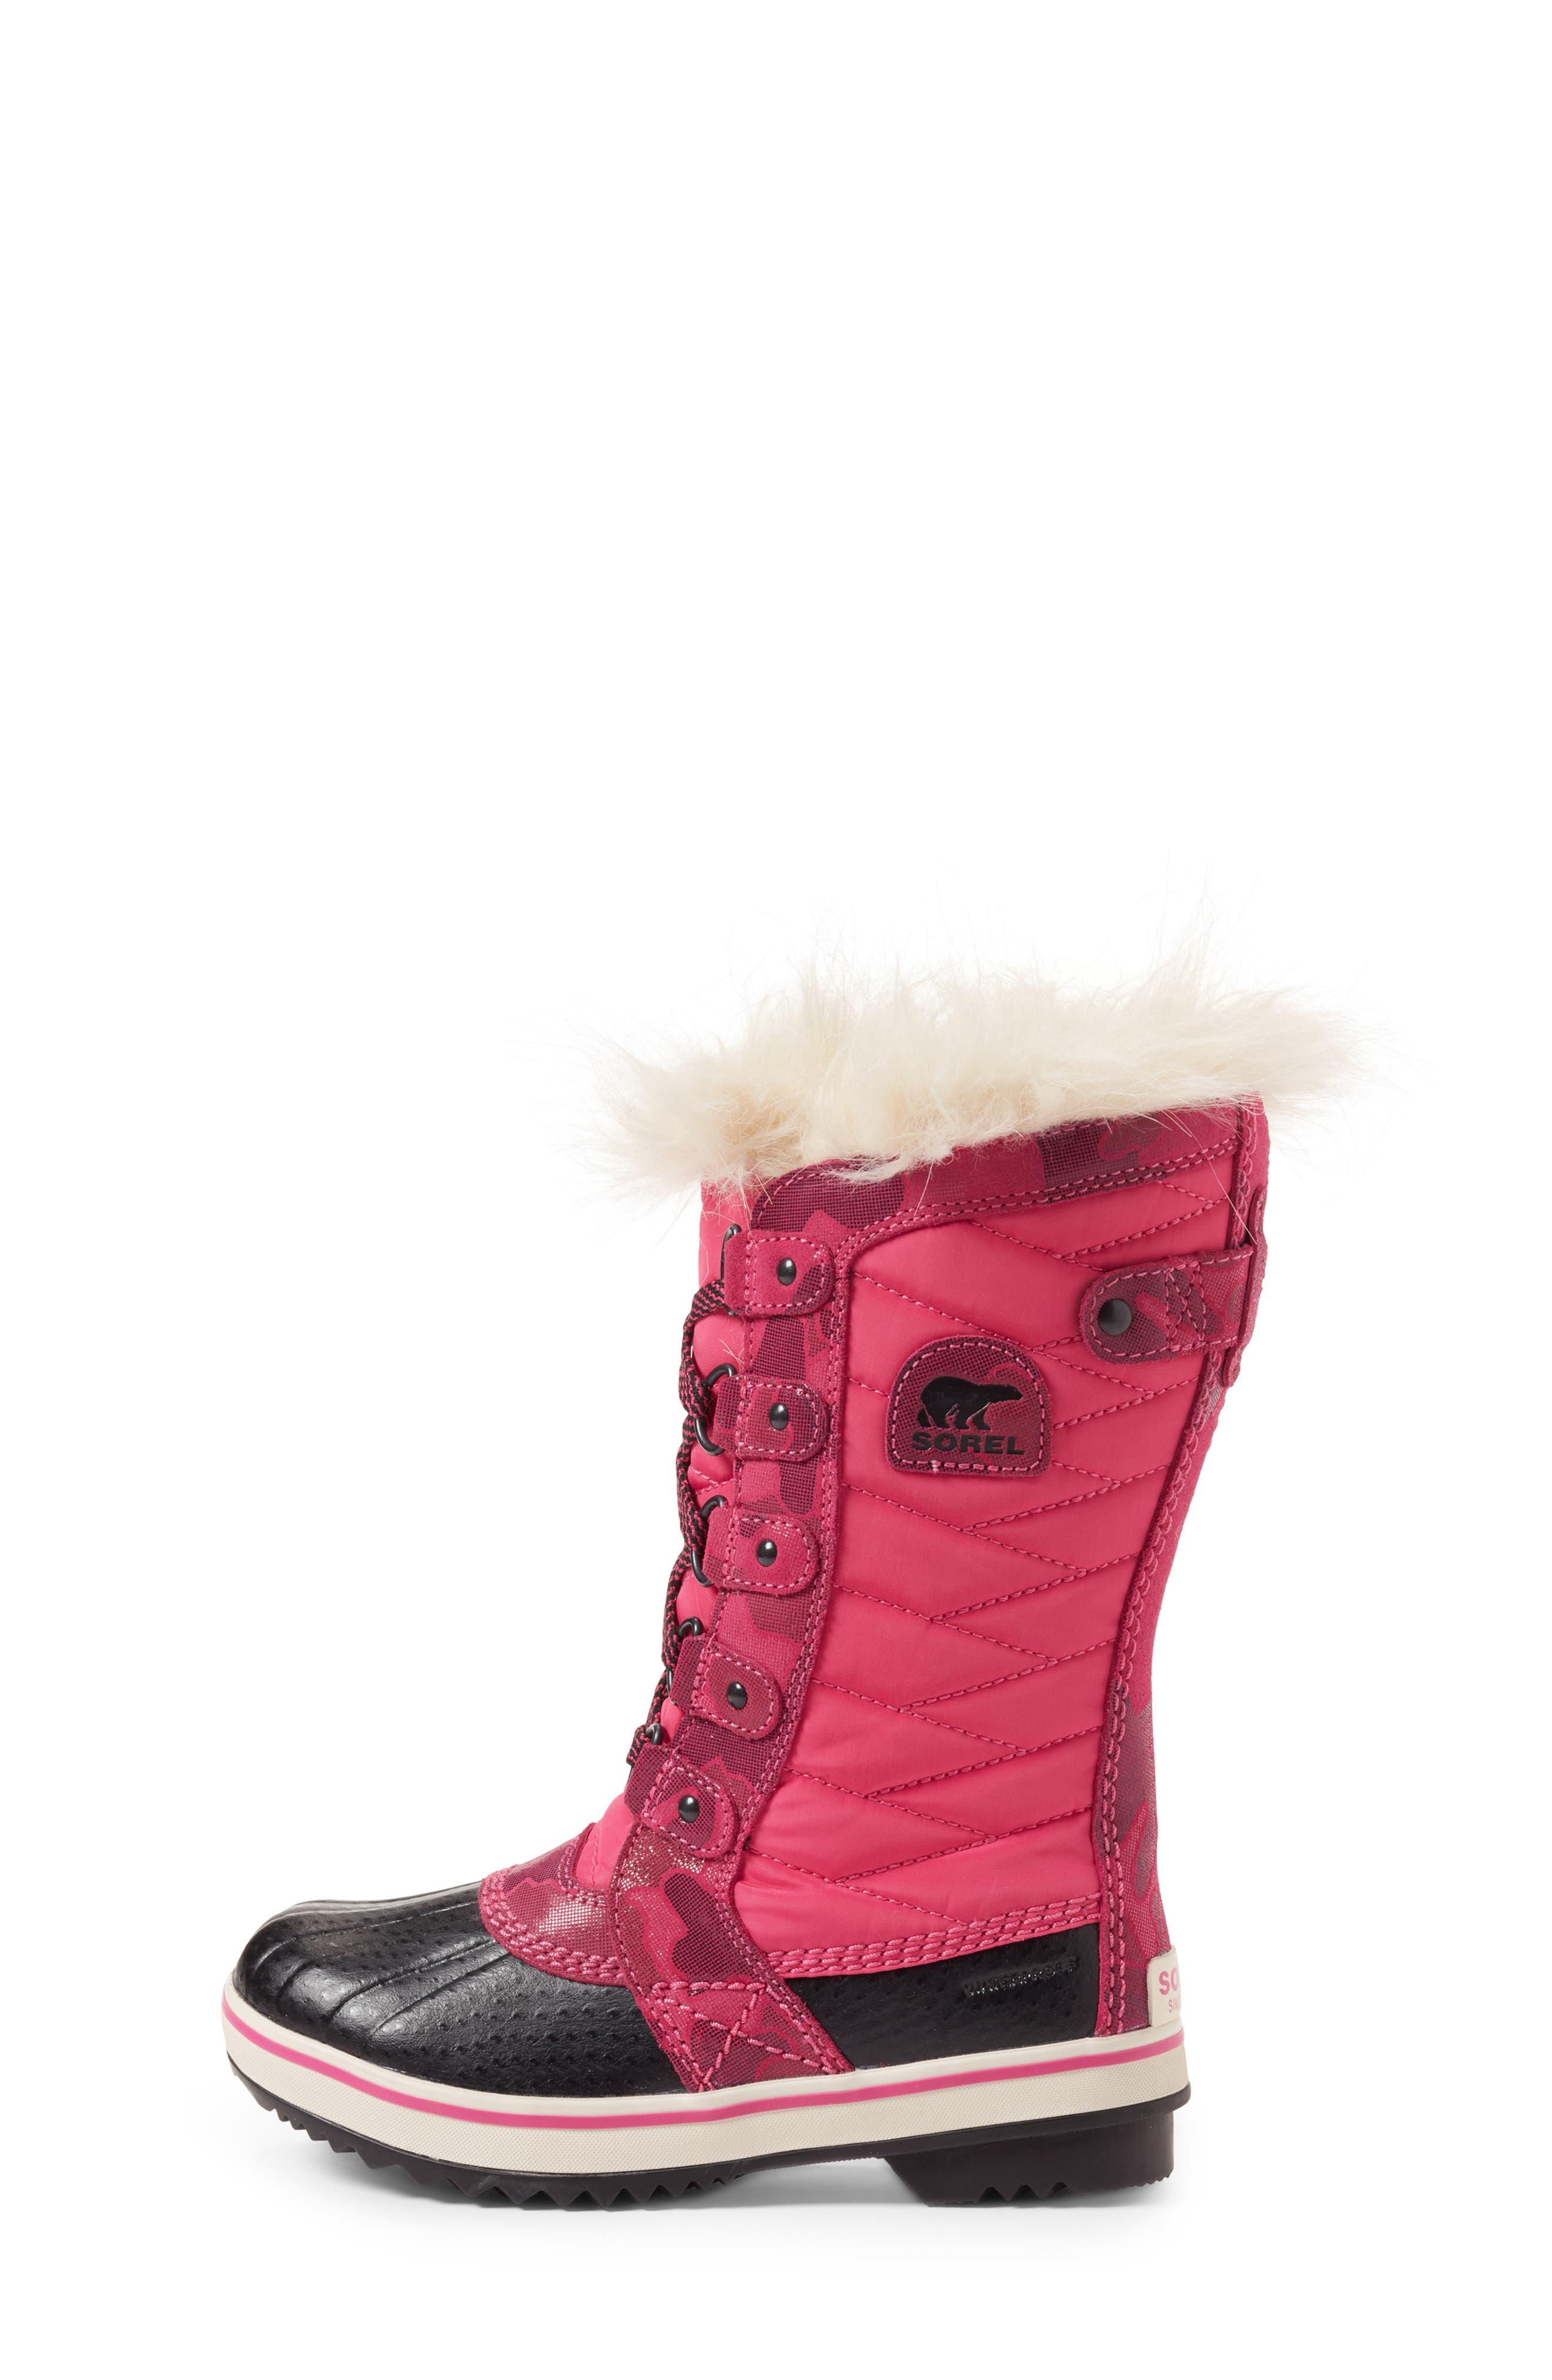 Alternate Image 3  - SOREL Tofino II Faux Fur Lined Waterproof Boot (Little Kid & Big Kid)